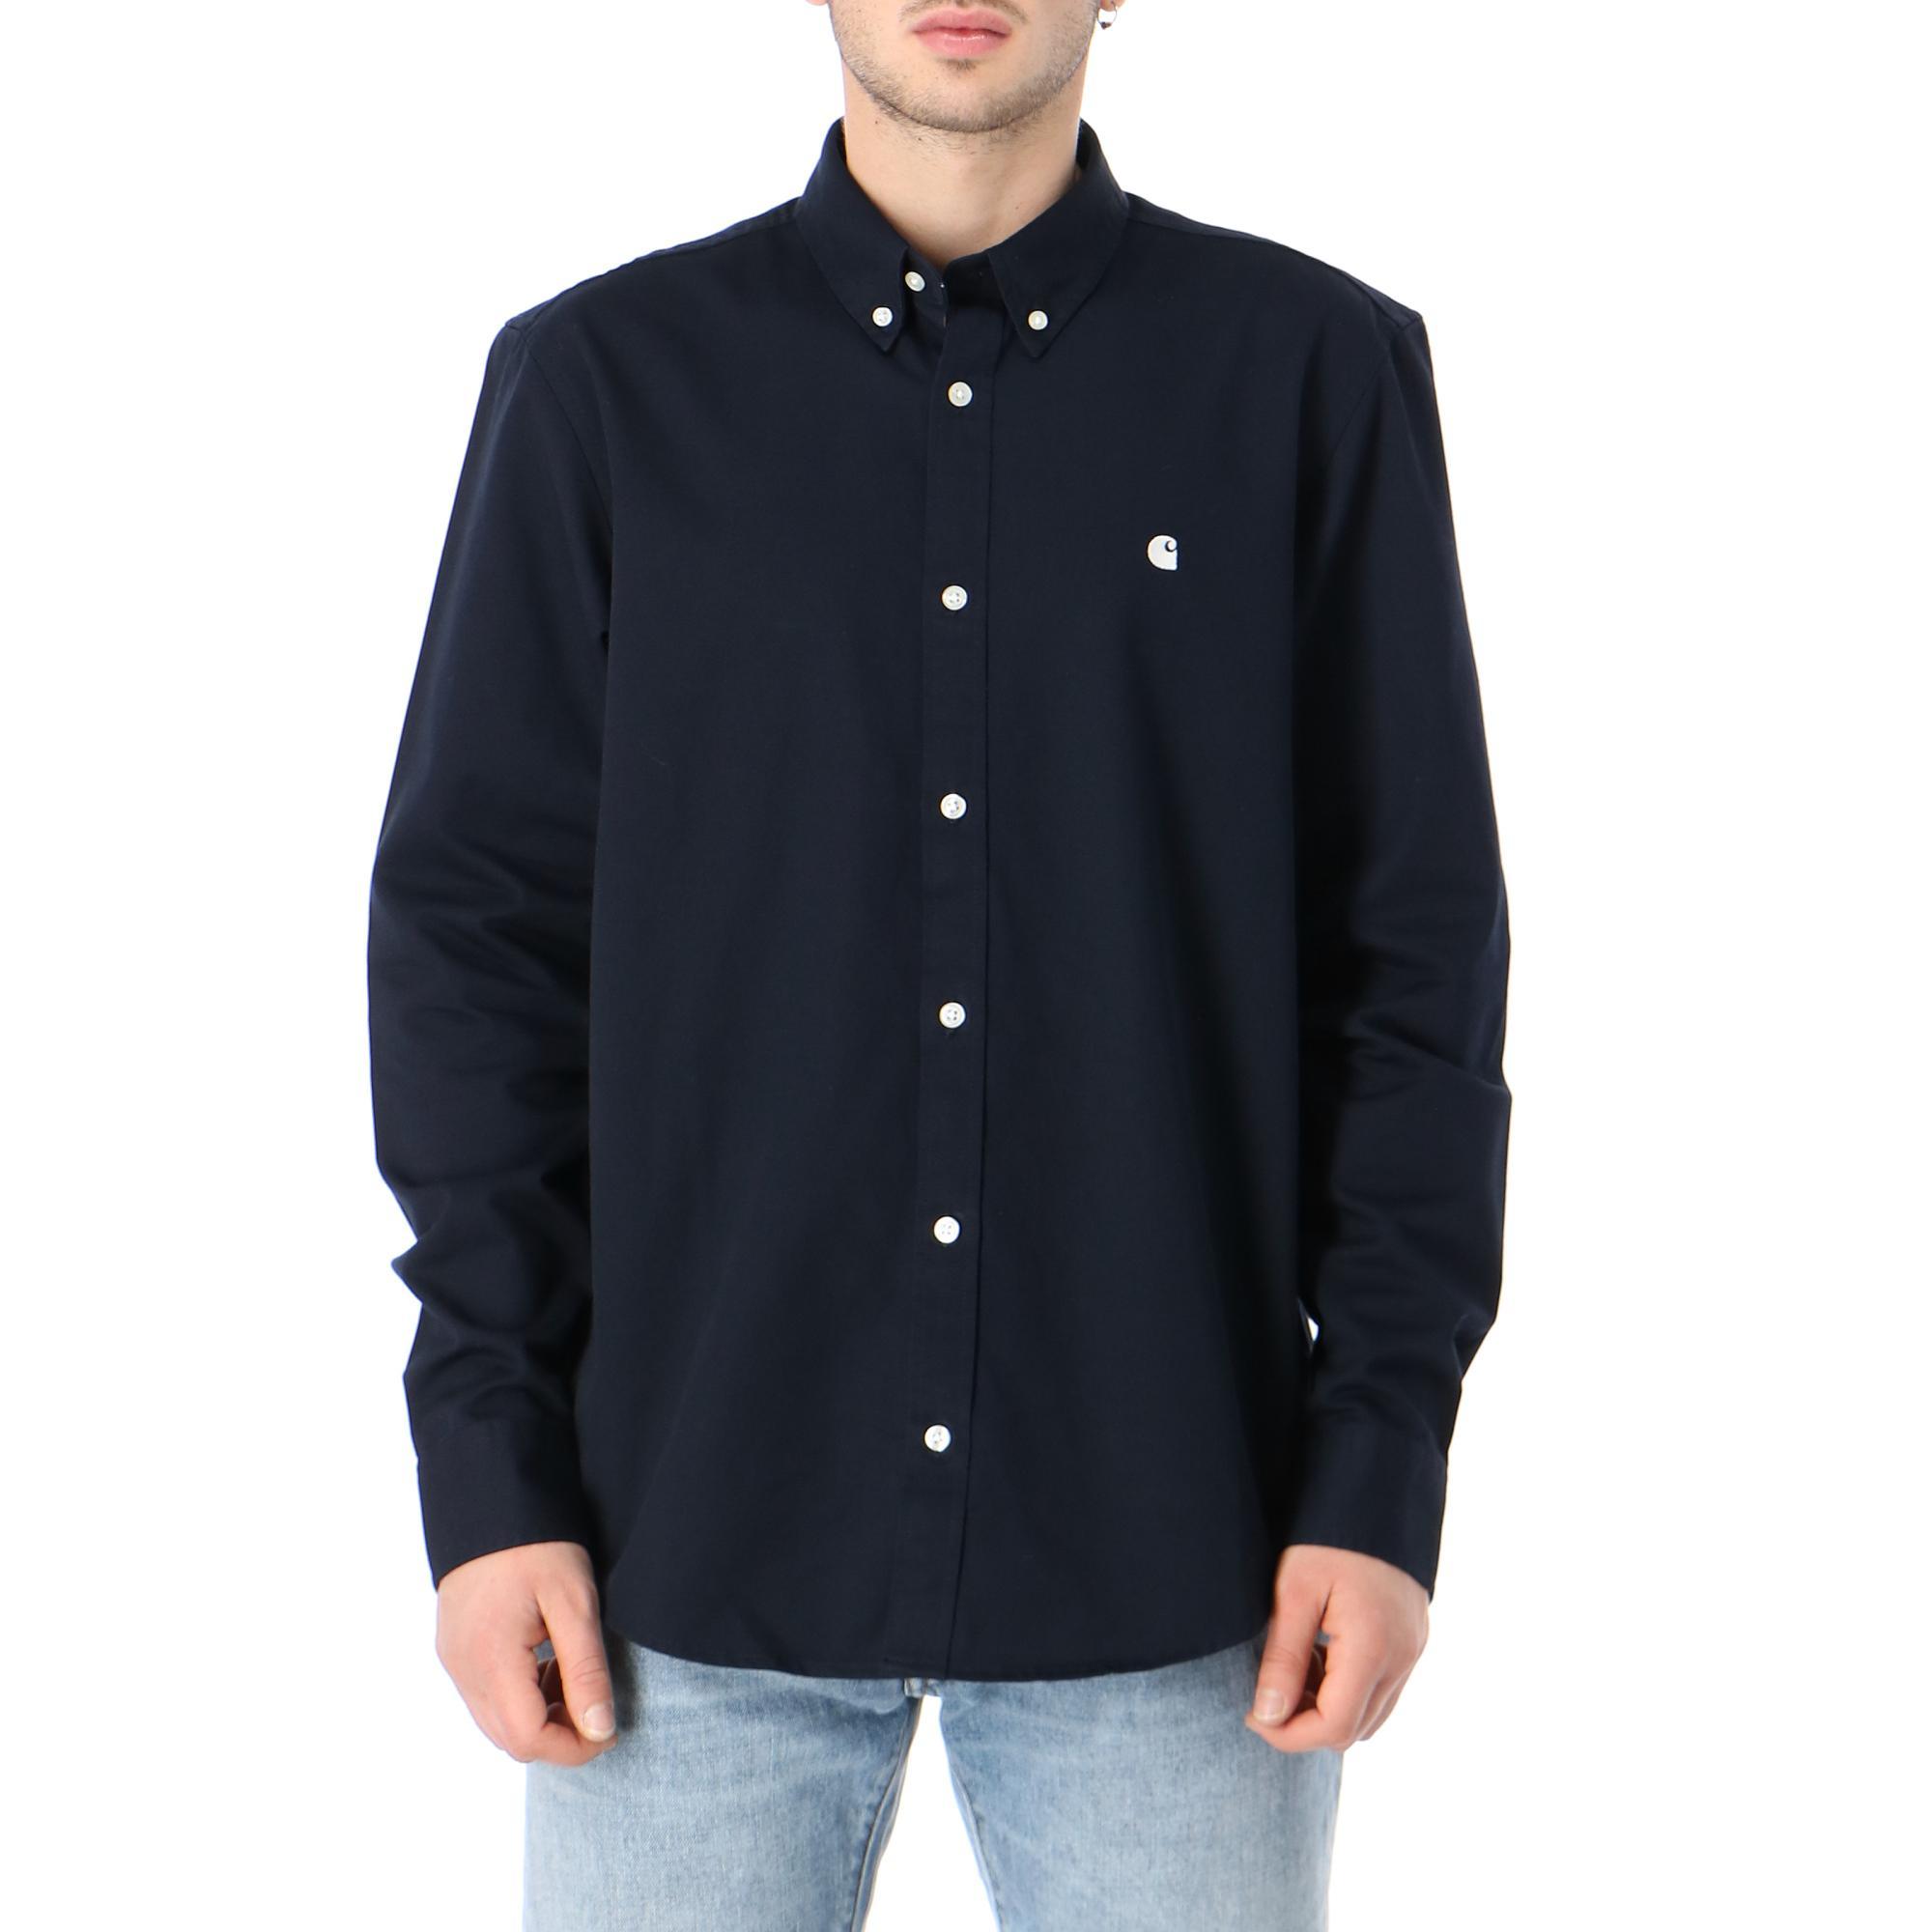 Carhartt L/s Madison Shirt Dark navy wax